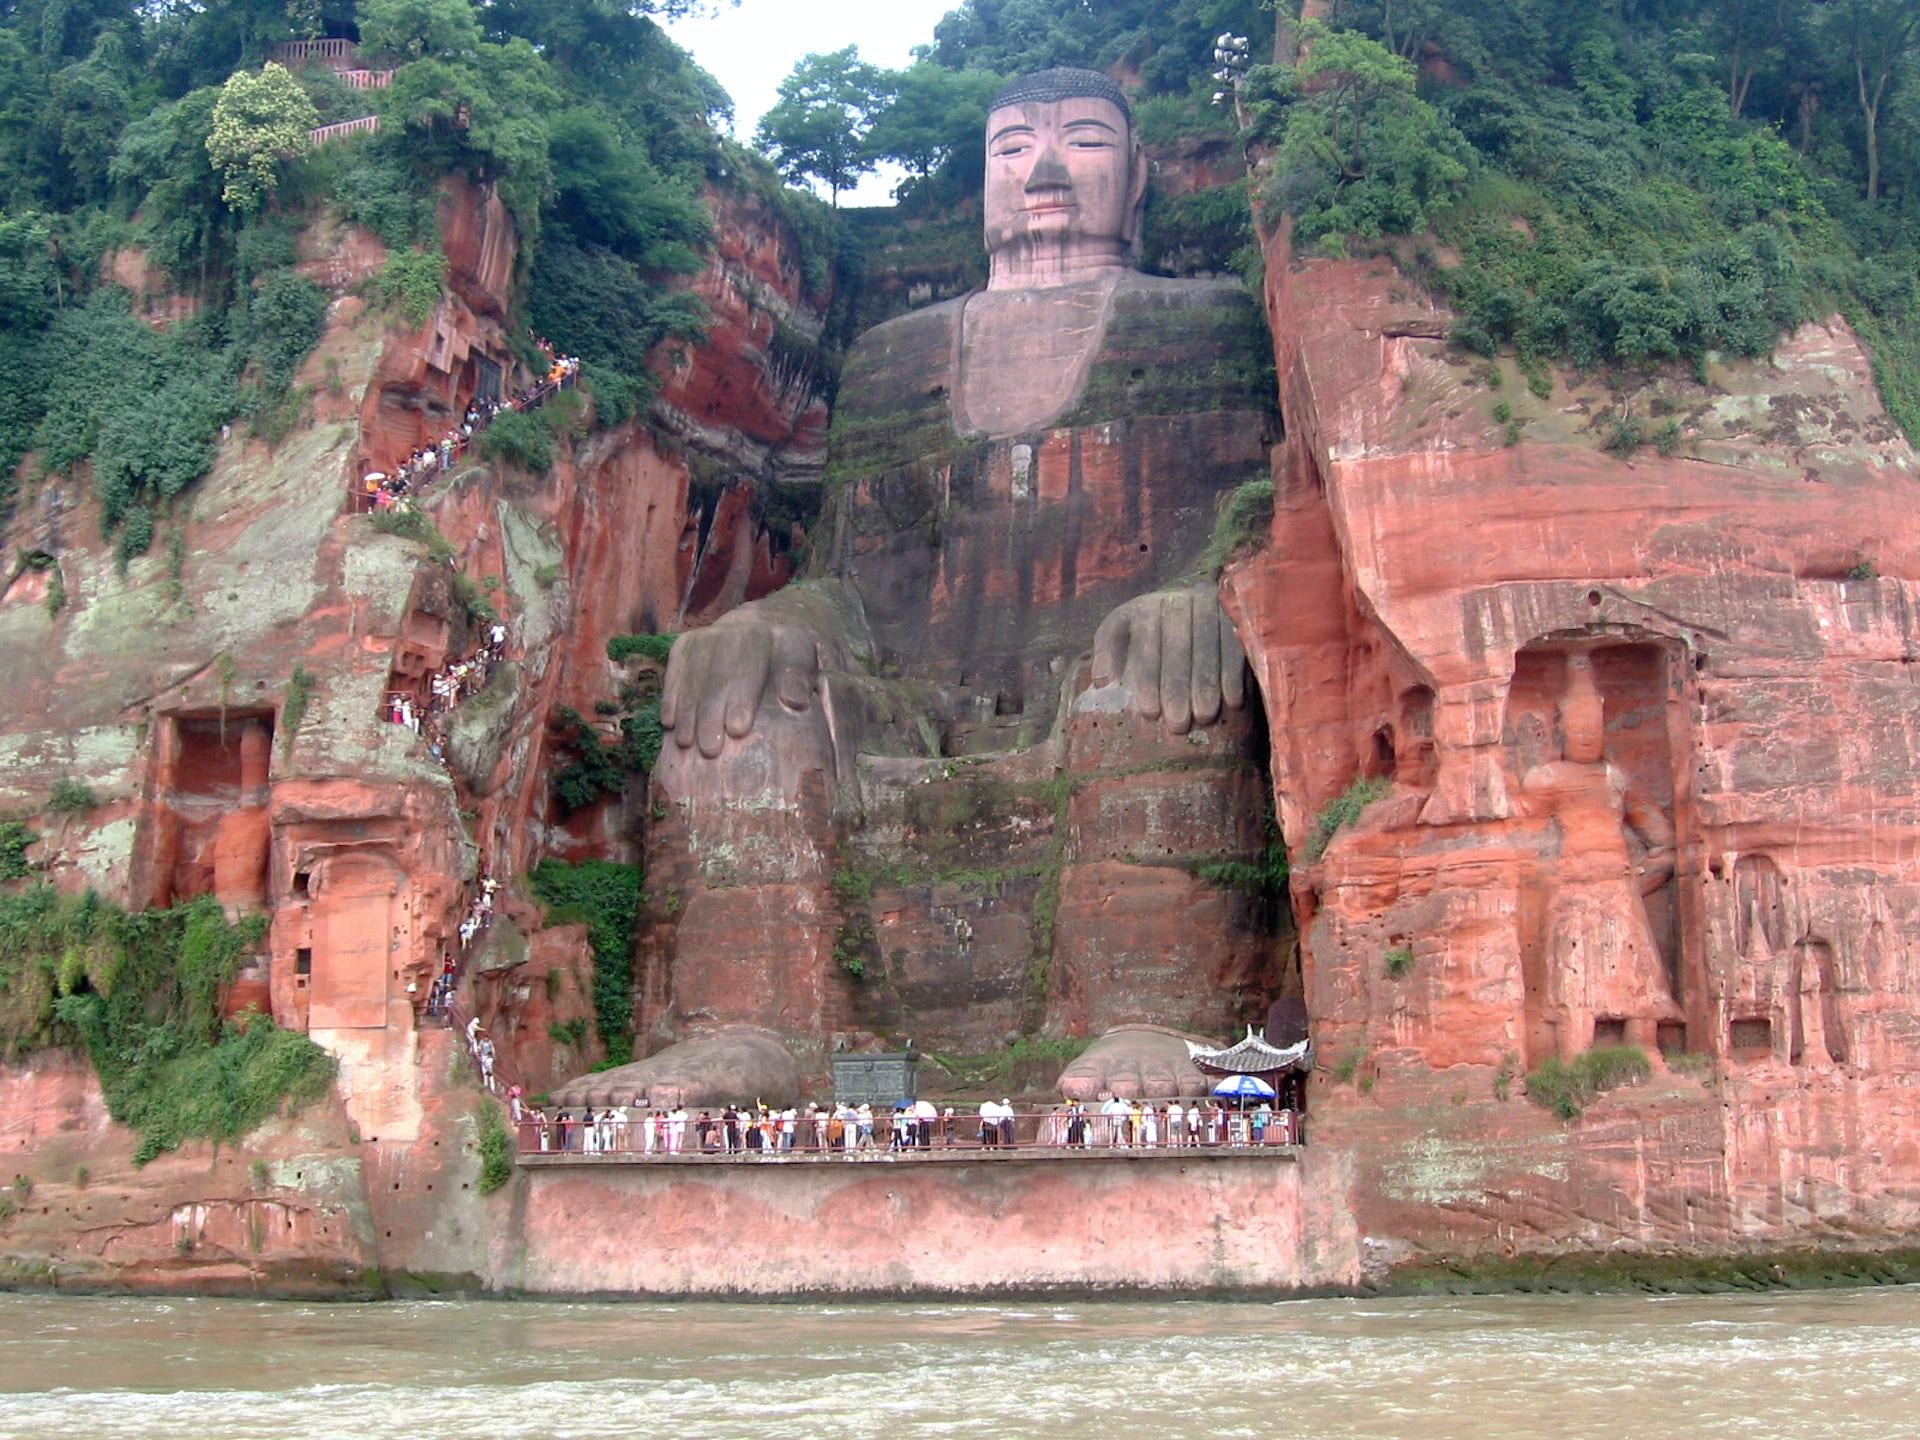 Giant Buddha Statue of Leshan, Sichuan, China. Photo credit: Ariel Steiner/wikipedia, CC BY-SA